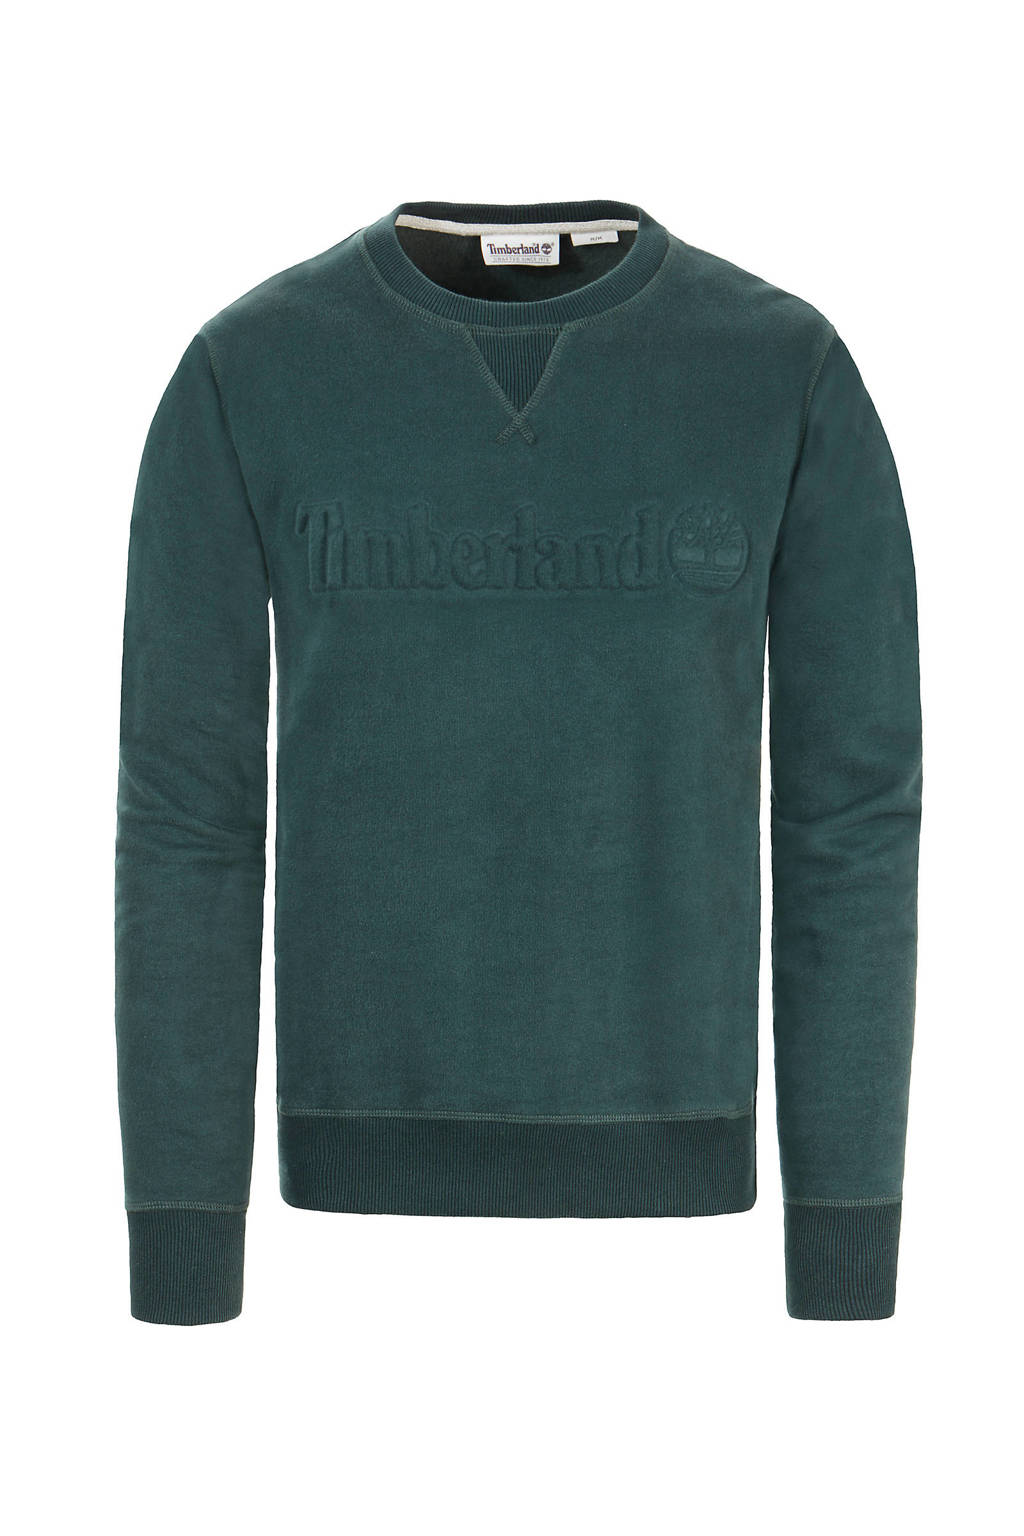 Timberland sweater met logo donkergroen, Donkergroen